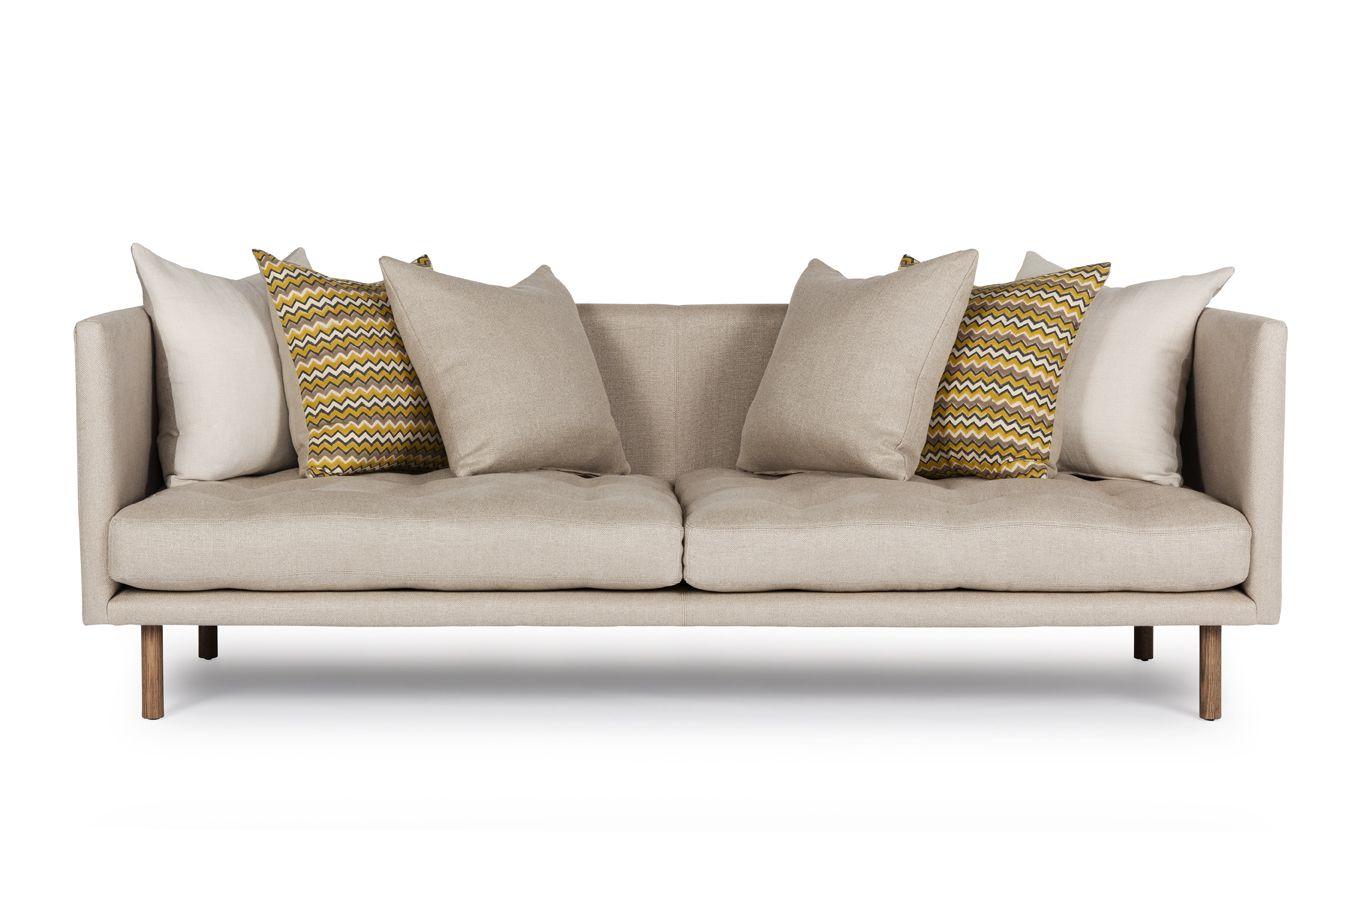 cool furniture melbourne. Jordan Sofa │ Http://arthurg.com.au/products-Jordan Cool Furniture Melbourne L